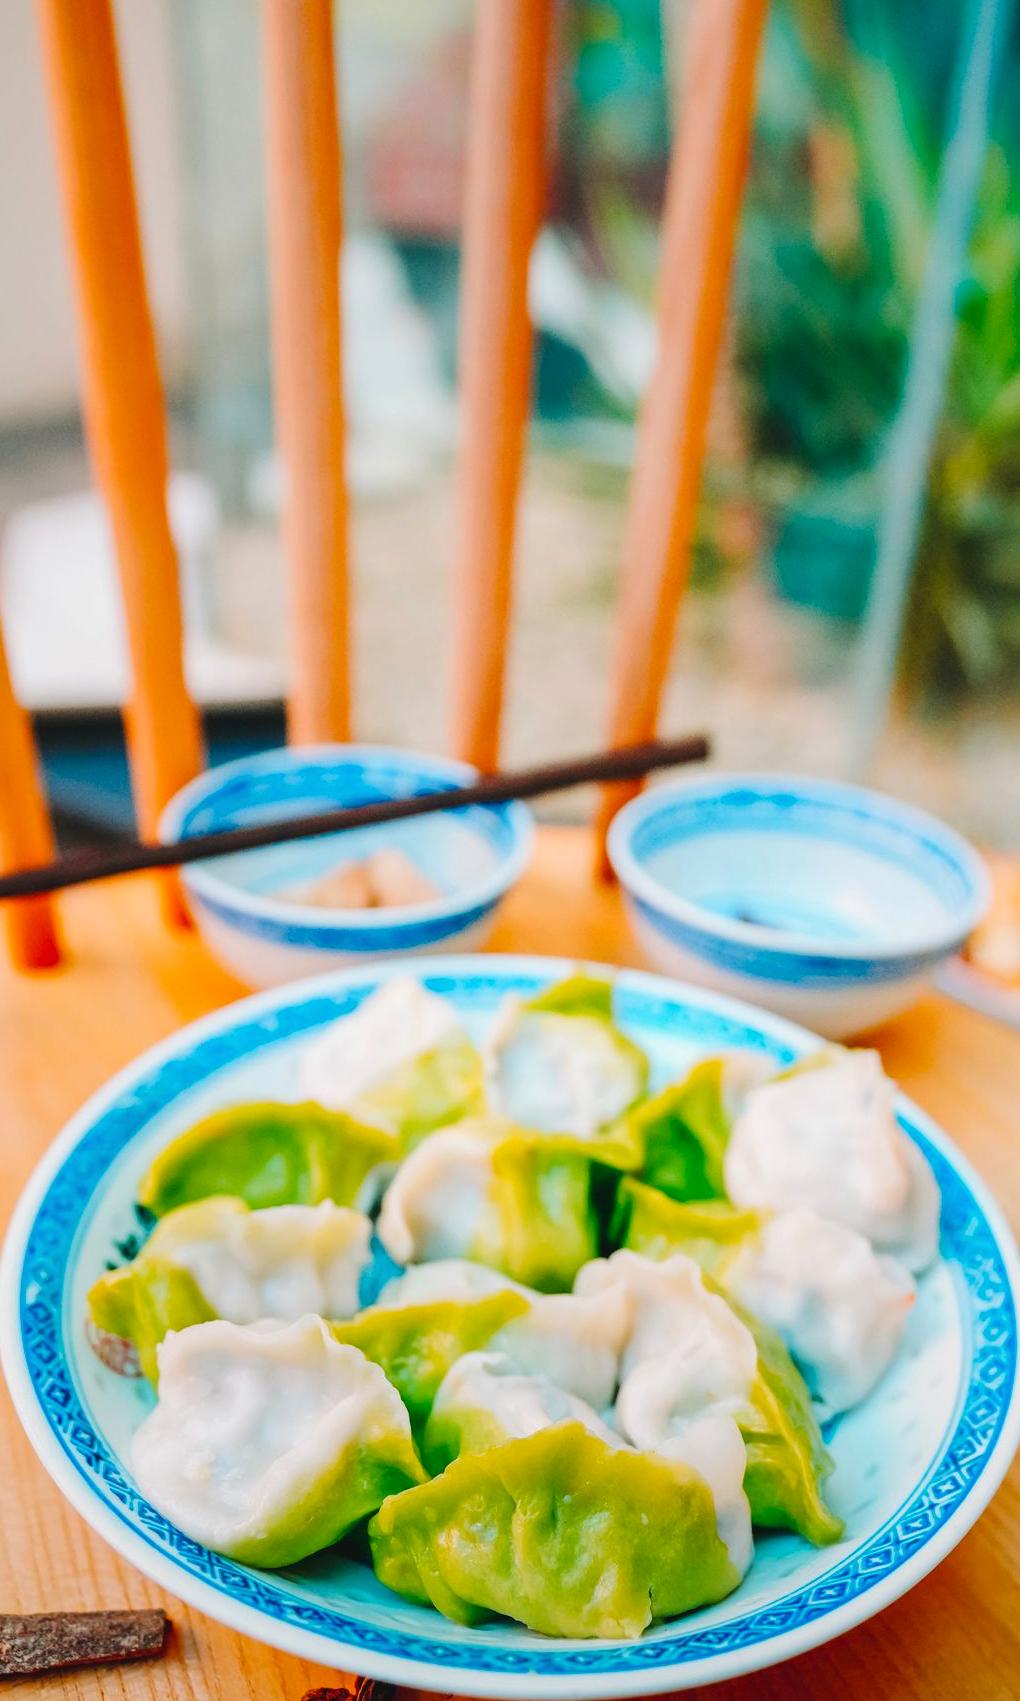 dumplings in bowl